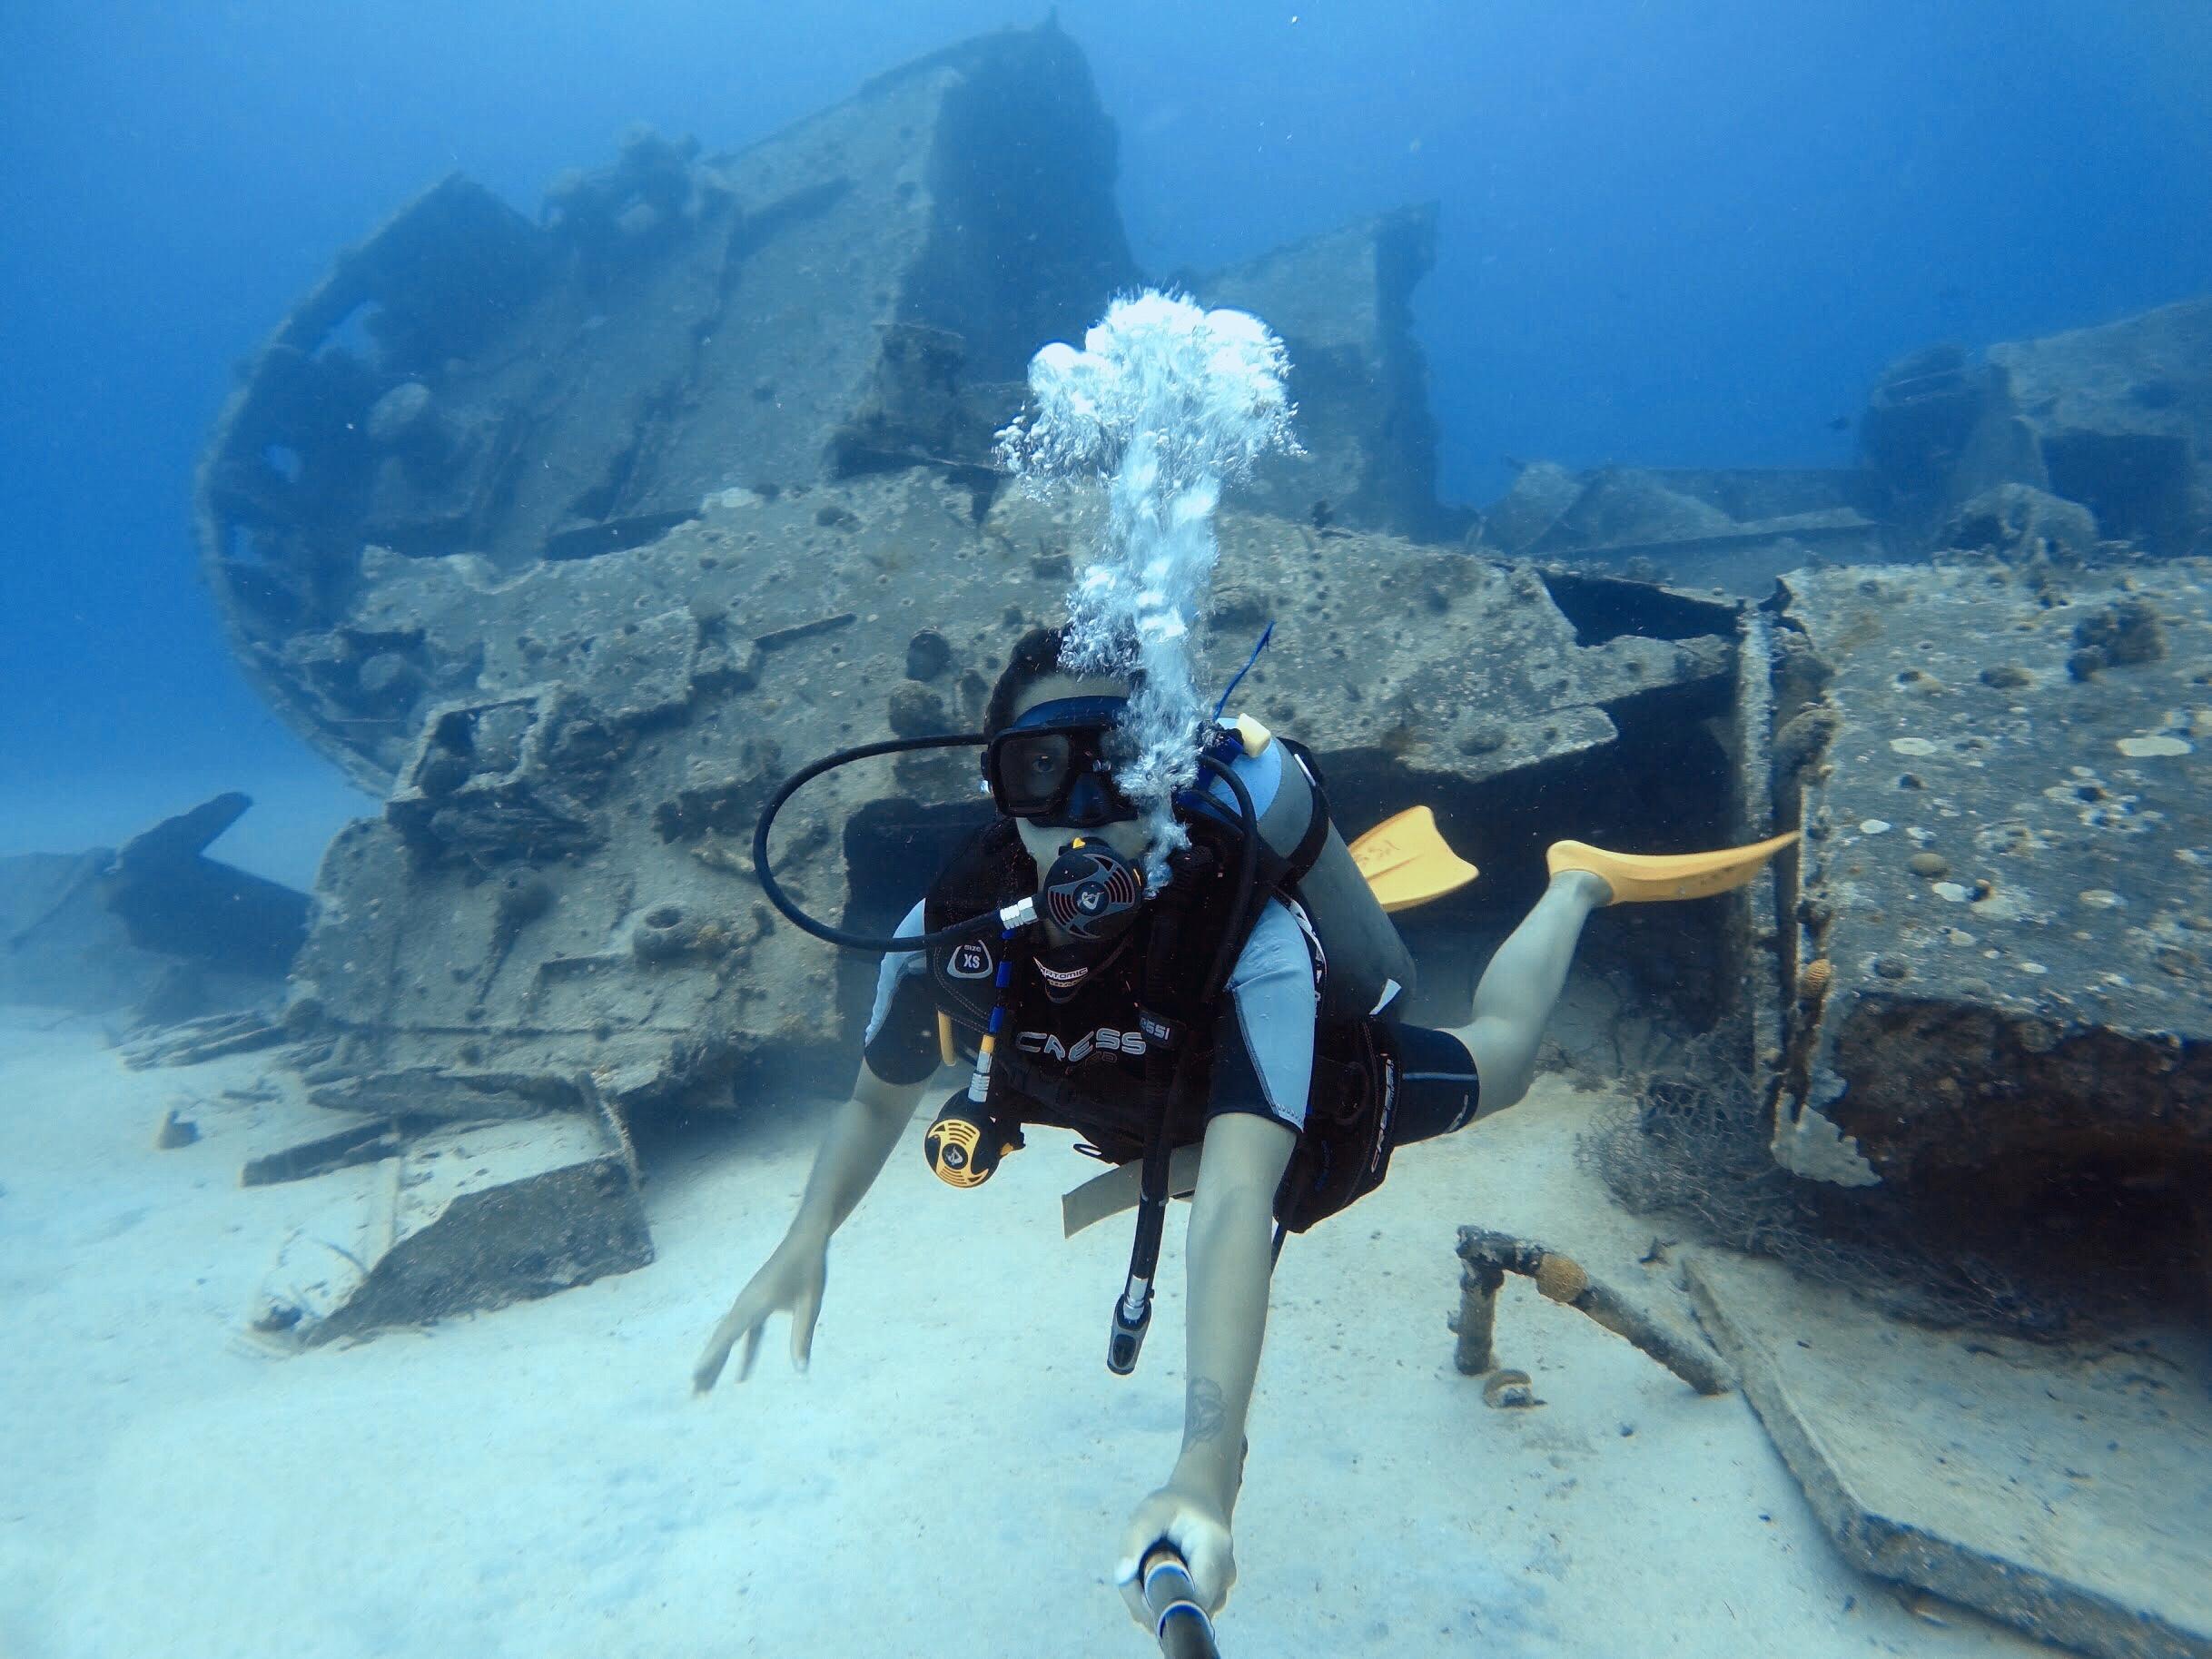 Mergulho no navio naufragado em San Andrés (Foto: Tati Sisti)